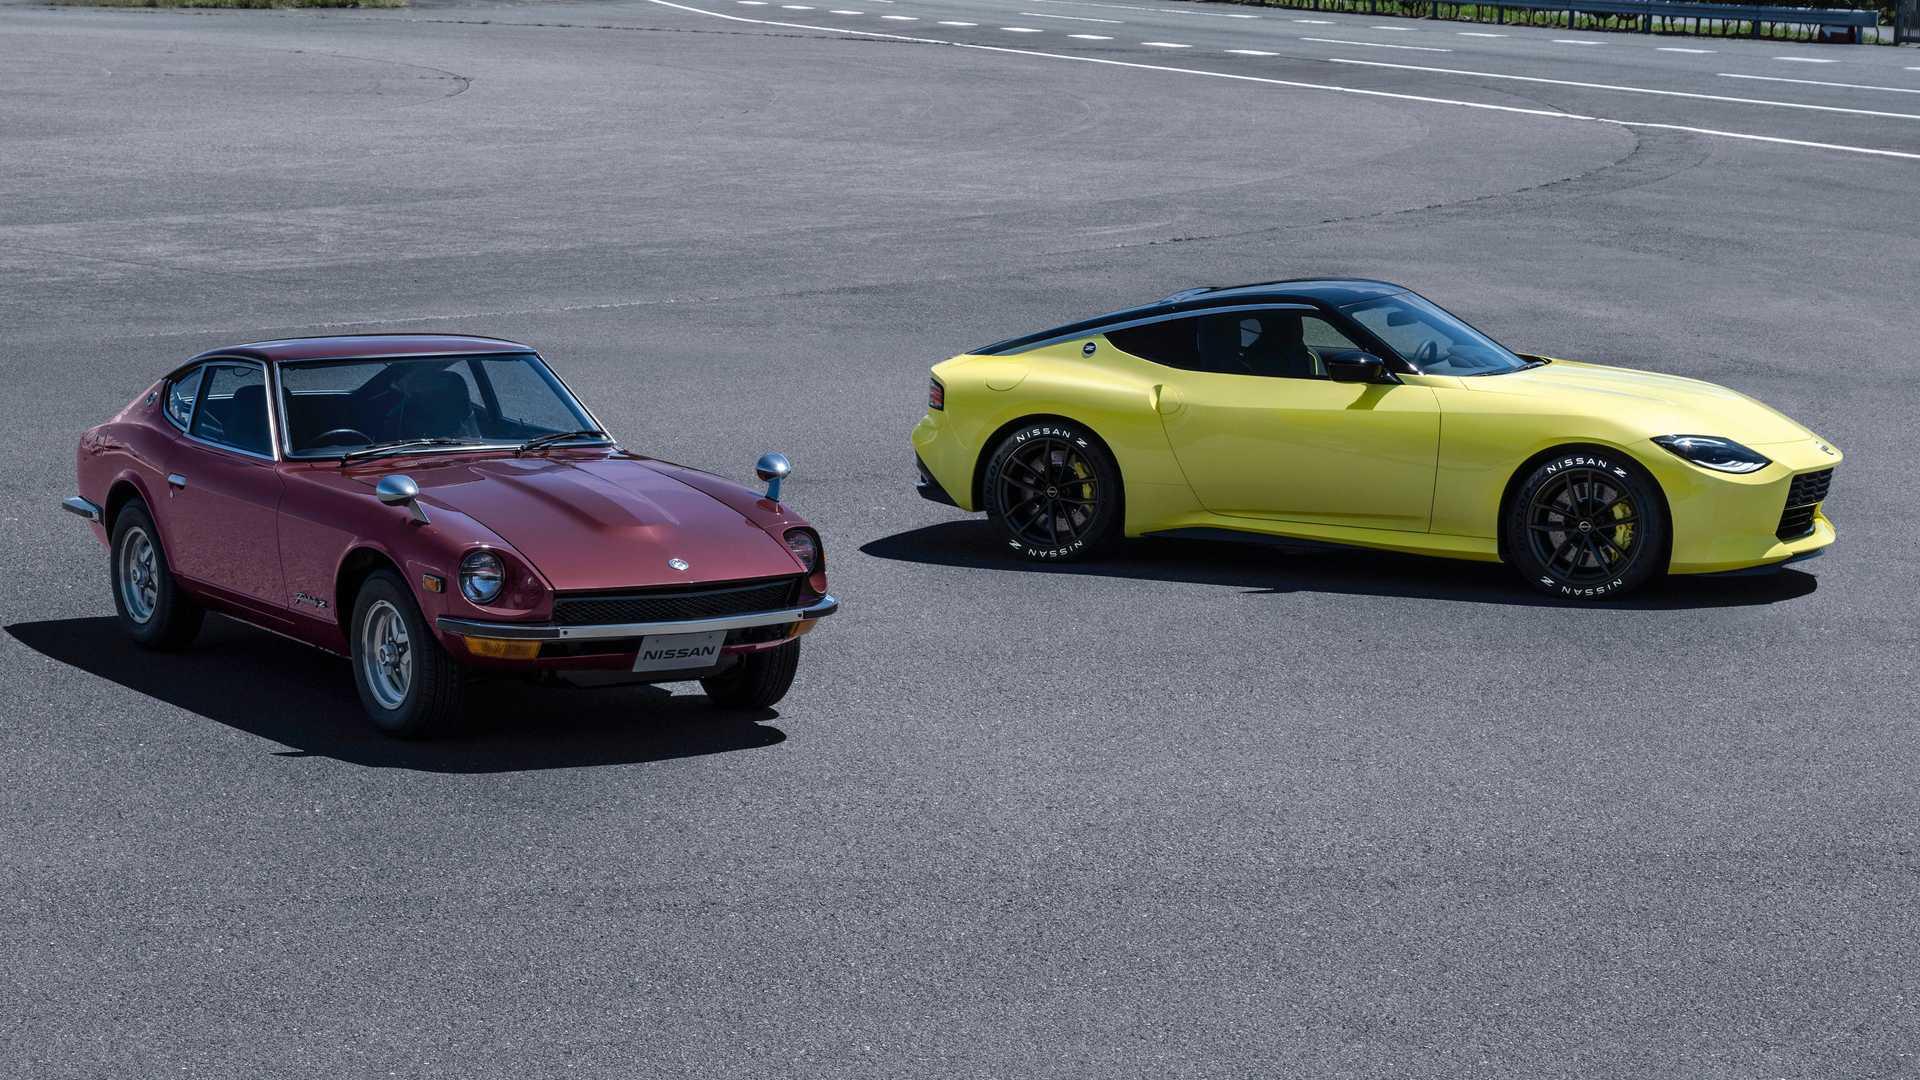 Nissan Z Proto Inspired from the original 240Z